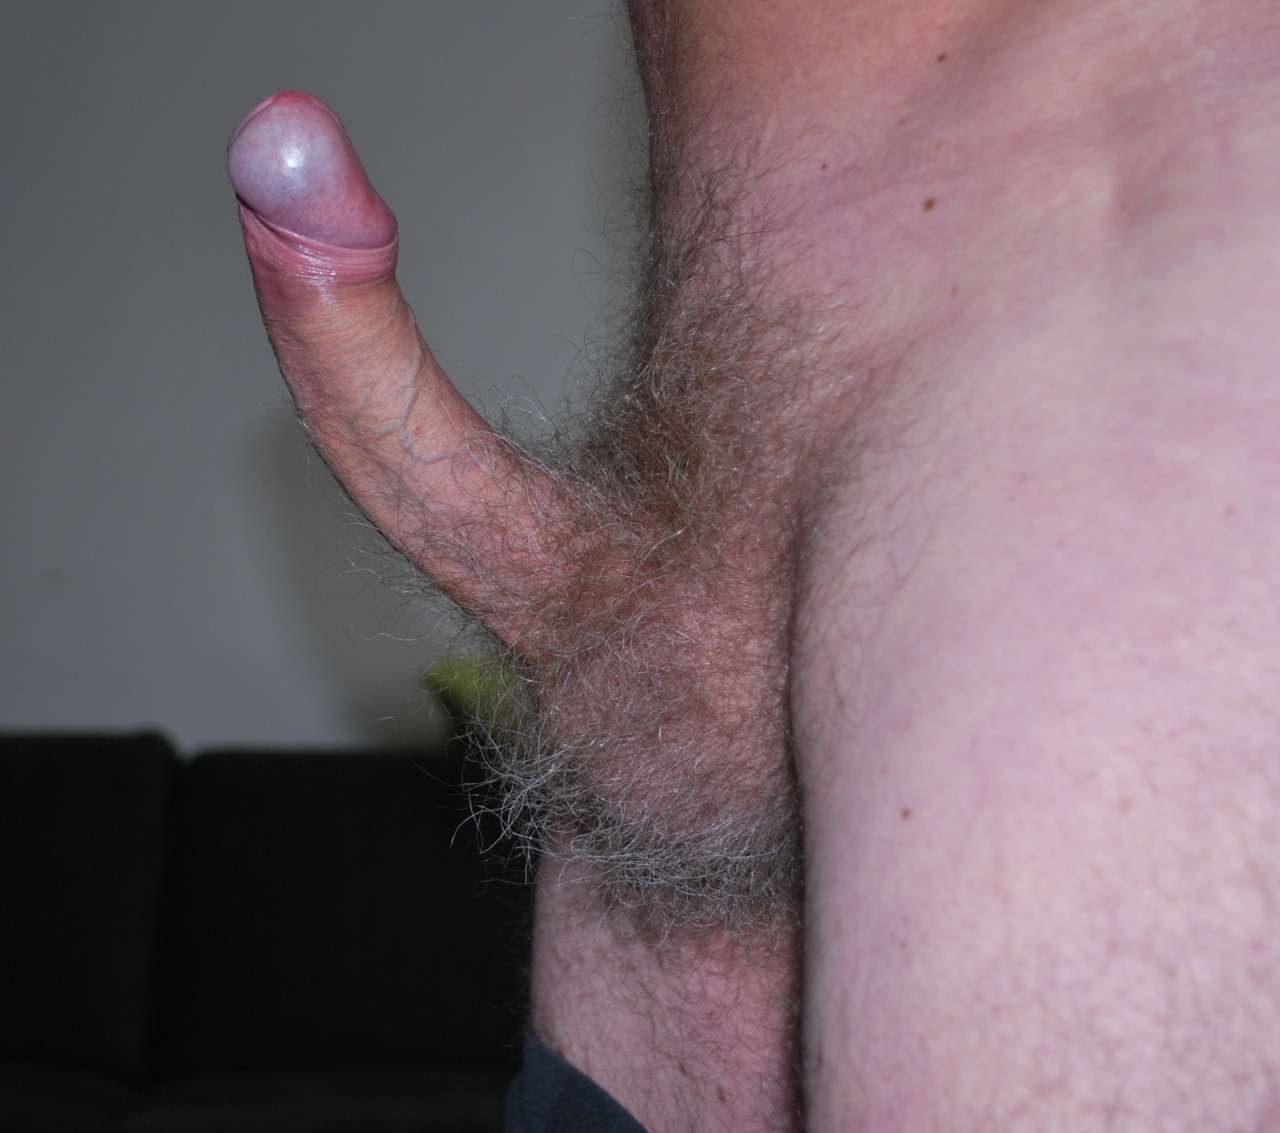 hairy balls: